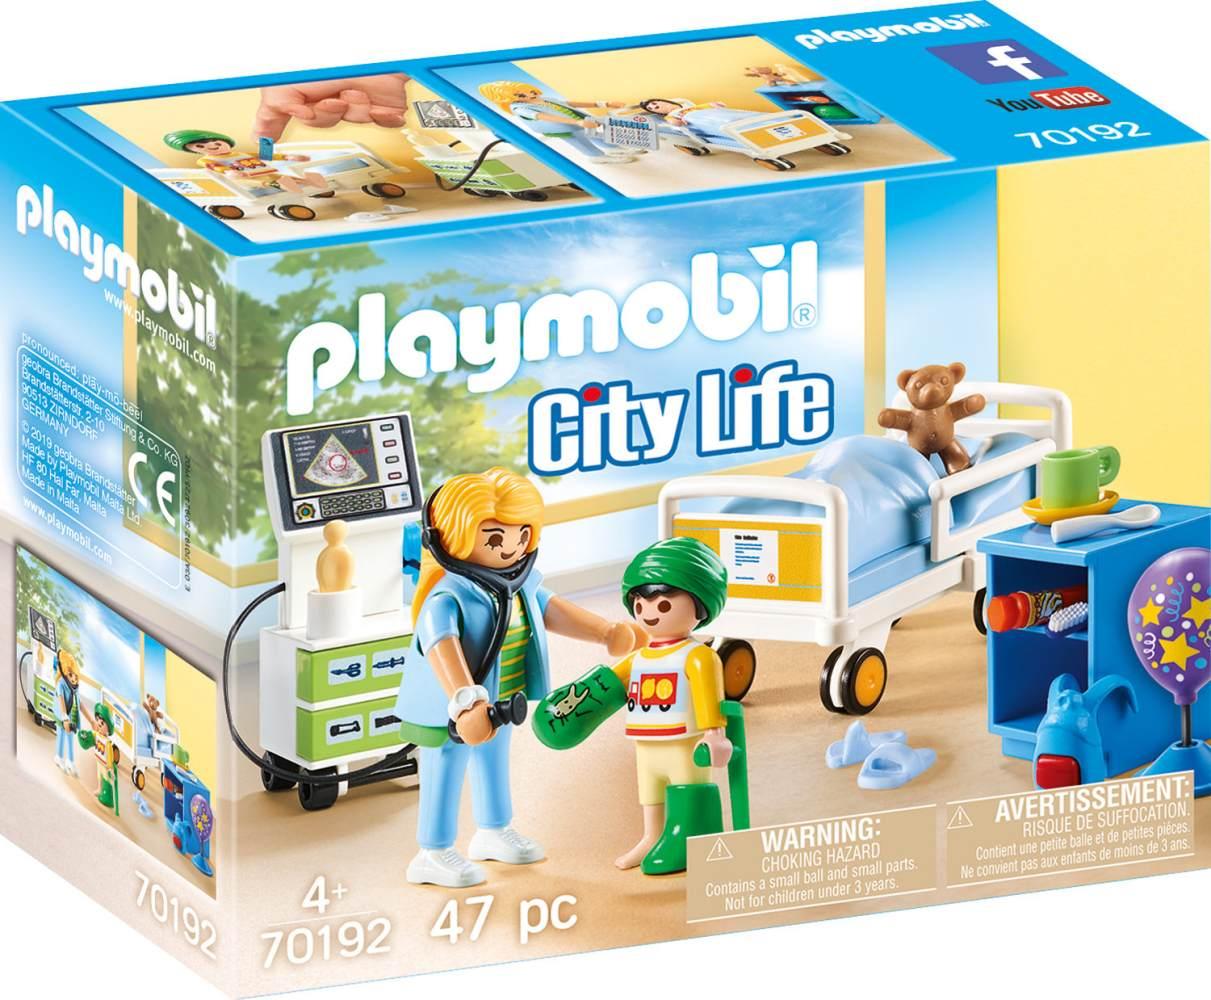 Playmobil City Life 70192 'Kinderkrankenzimmer', 47 Teile, ab 4 Jahren Bild 1